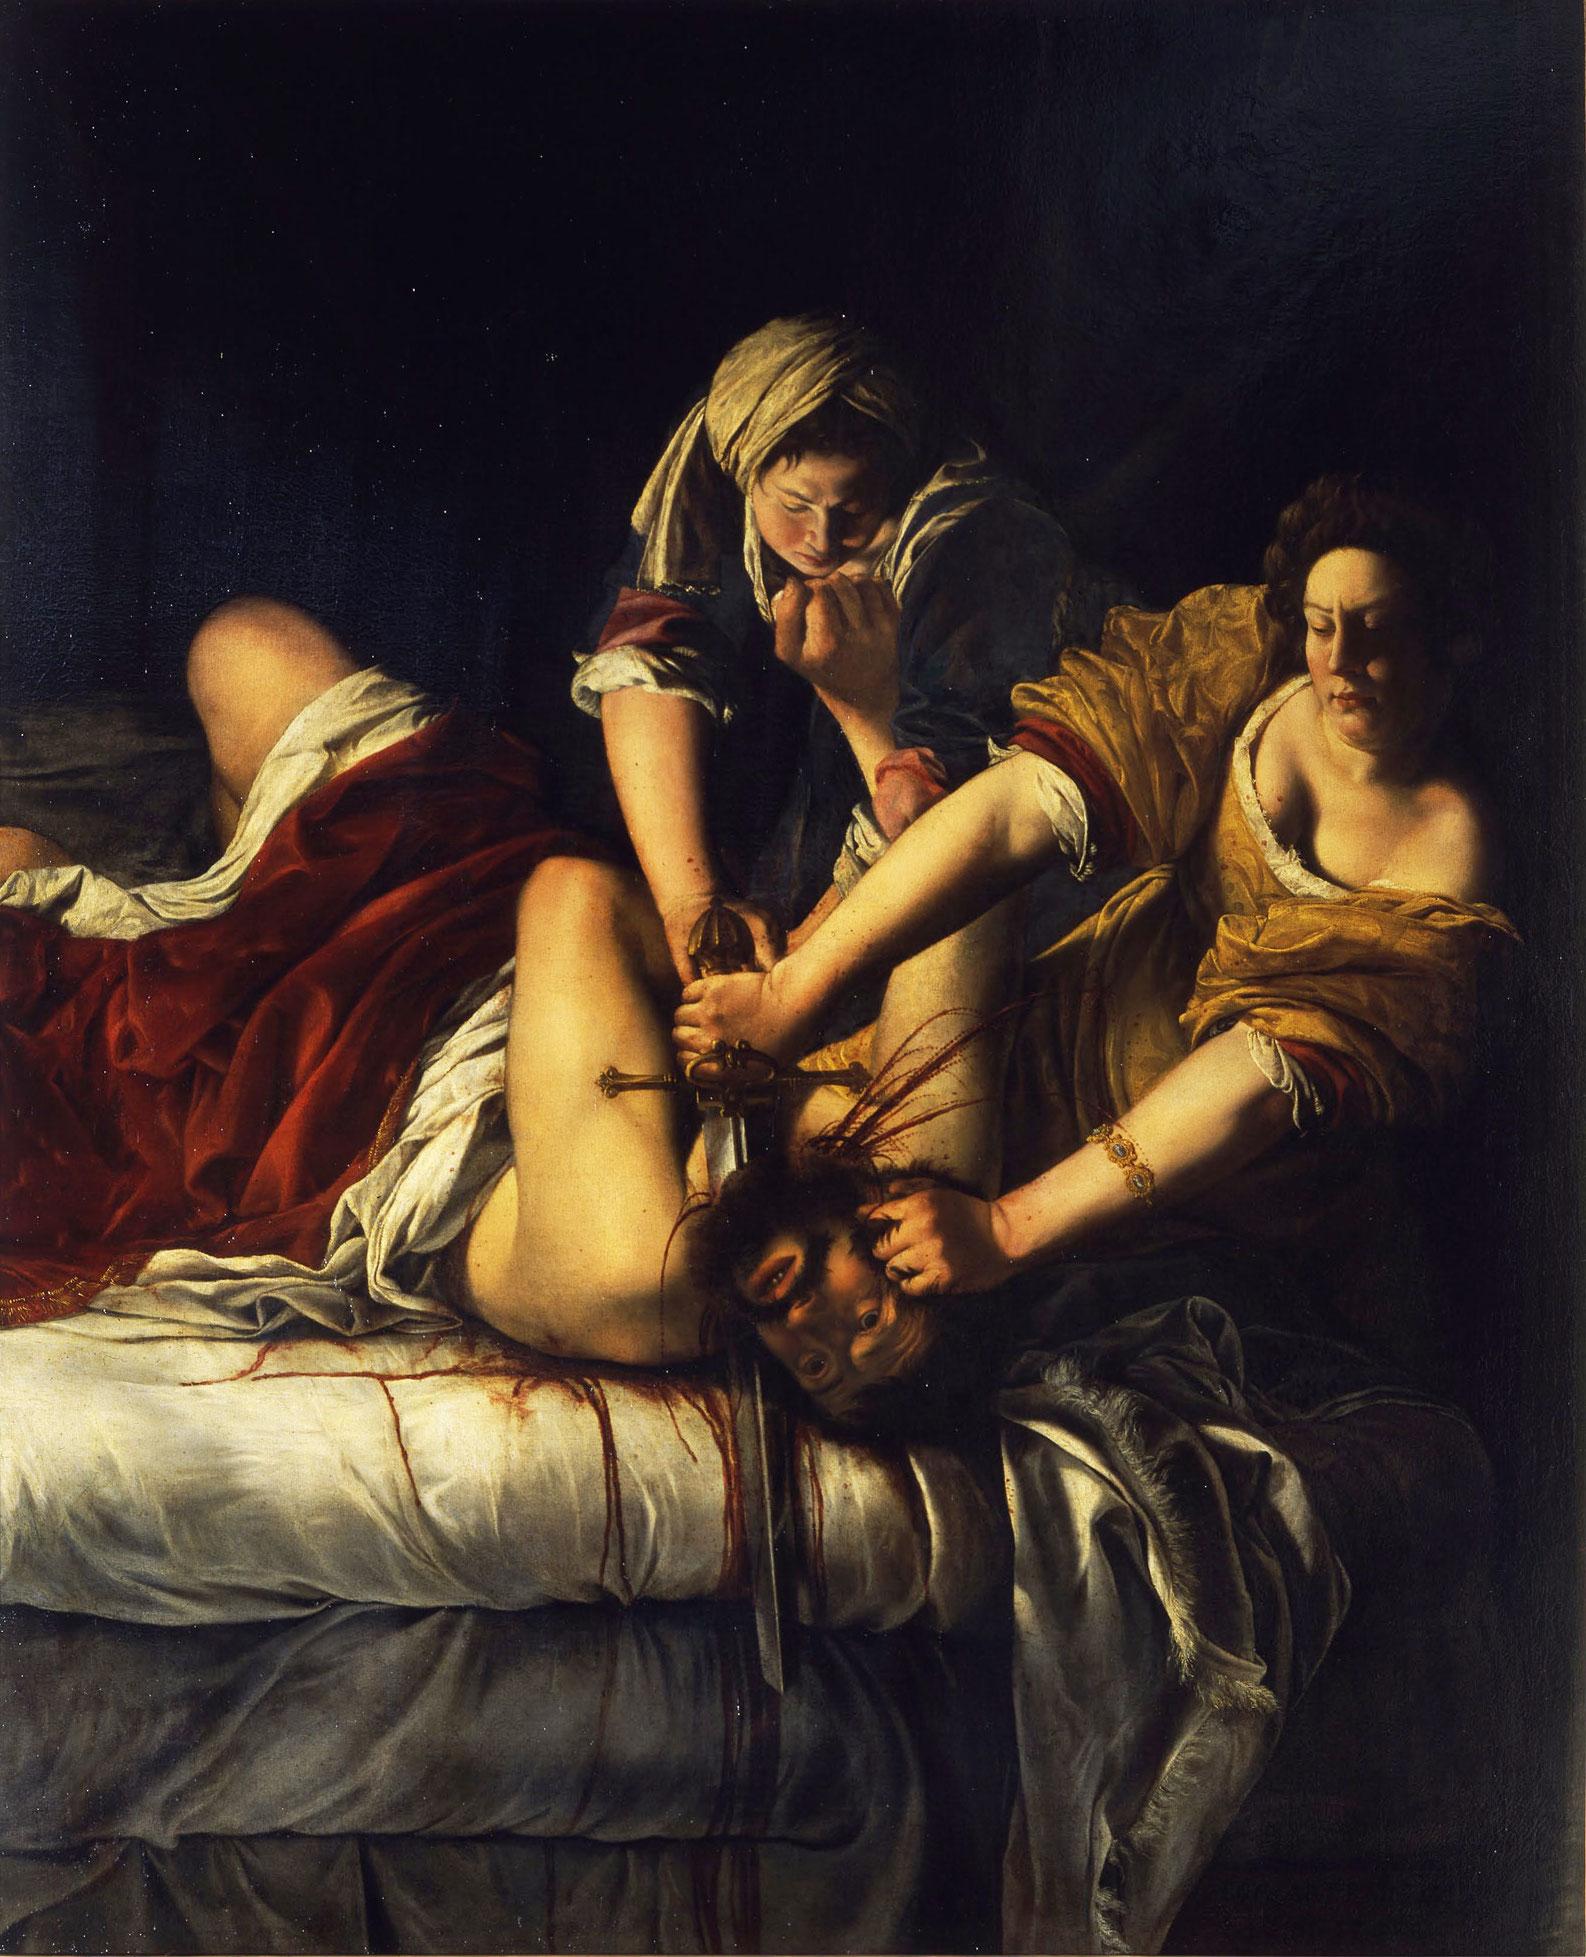 Artemisia Gentileschi: Judith Slaying Holofernes, circa 1620